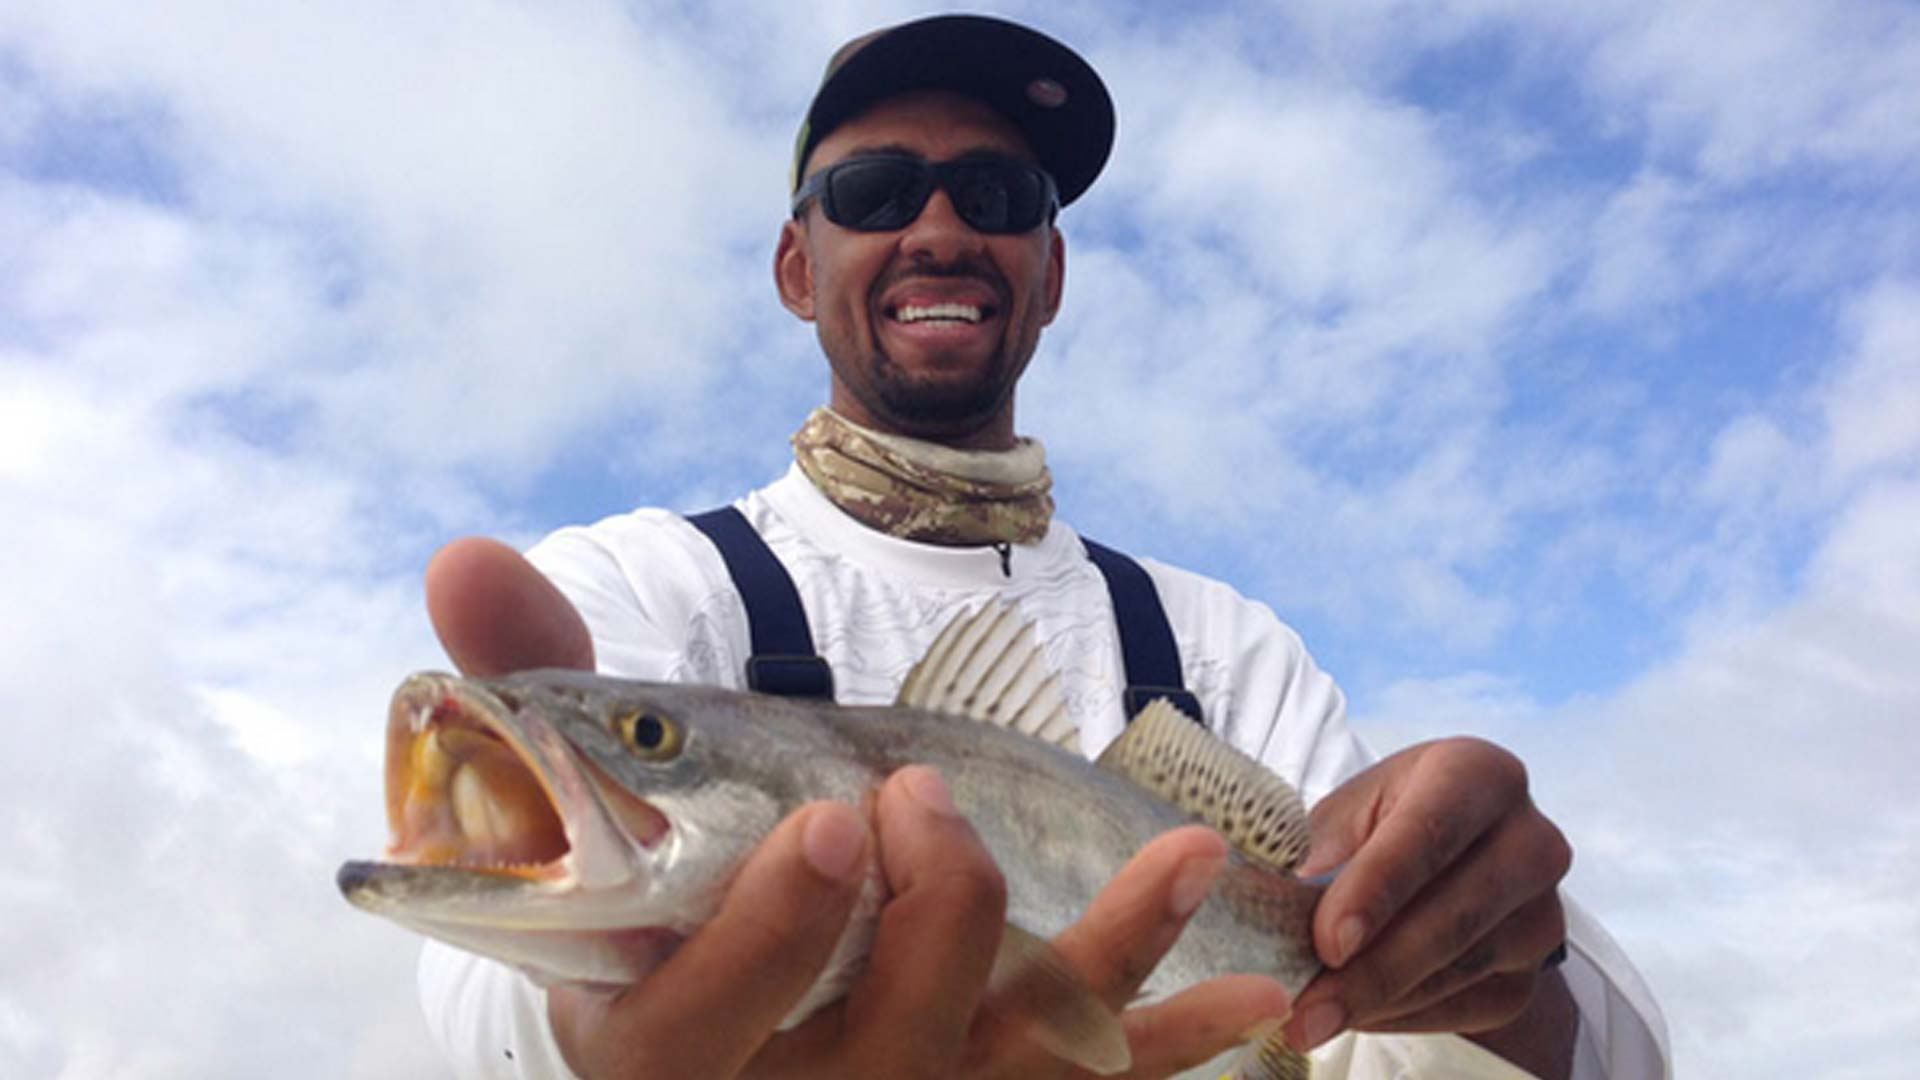 Jared-jeffries-fishing-2514-outdoorschannel-ftr